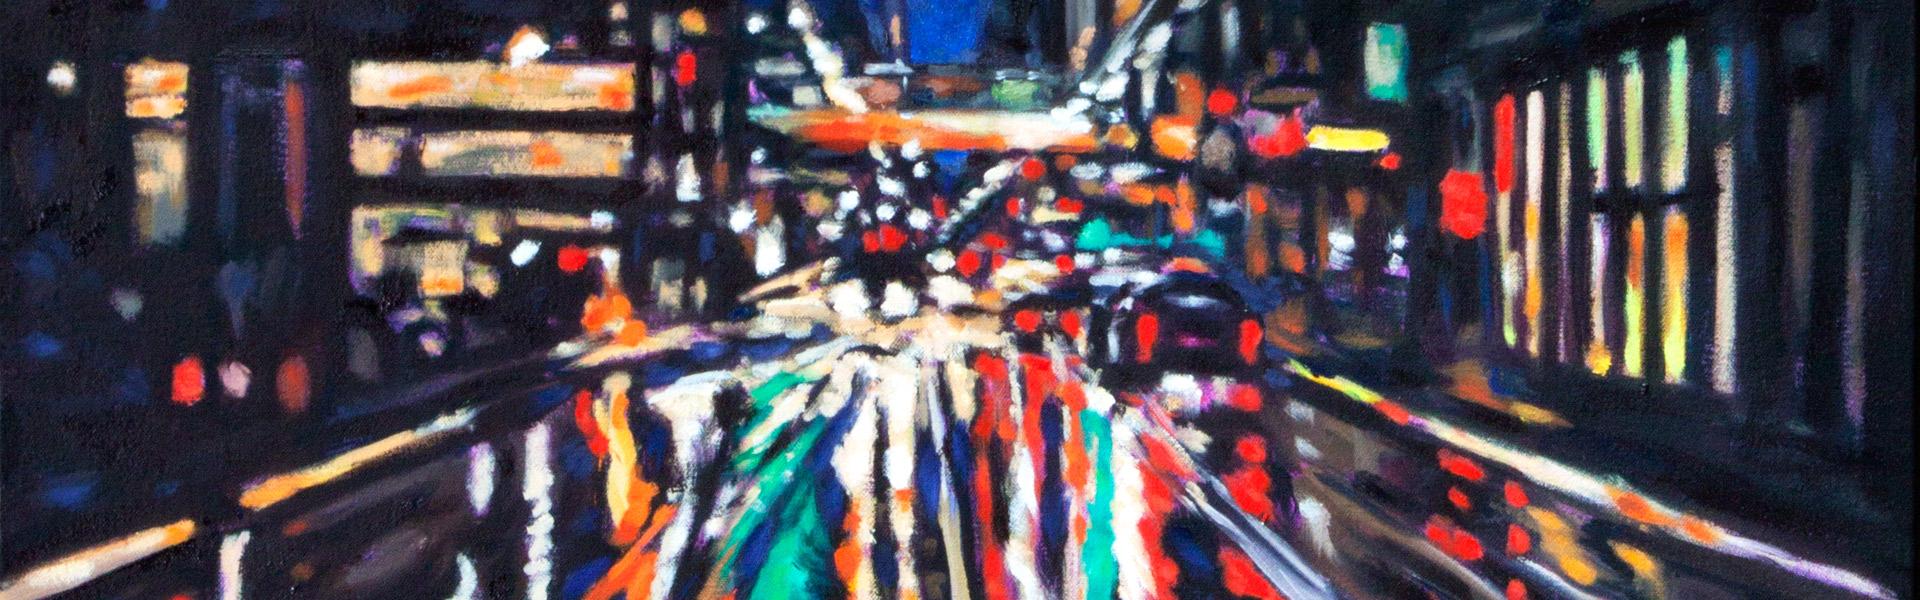 banner_RN-banner-Neon-Centric.20210516115305.jpg